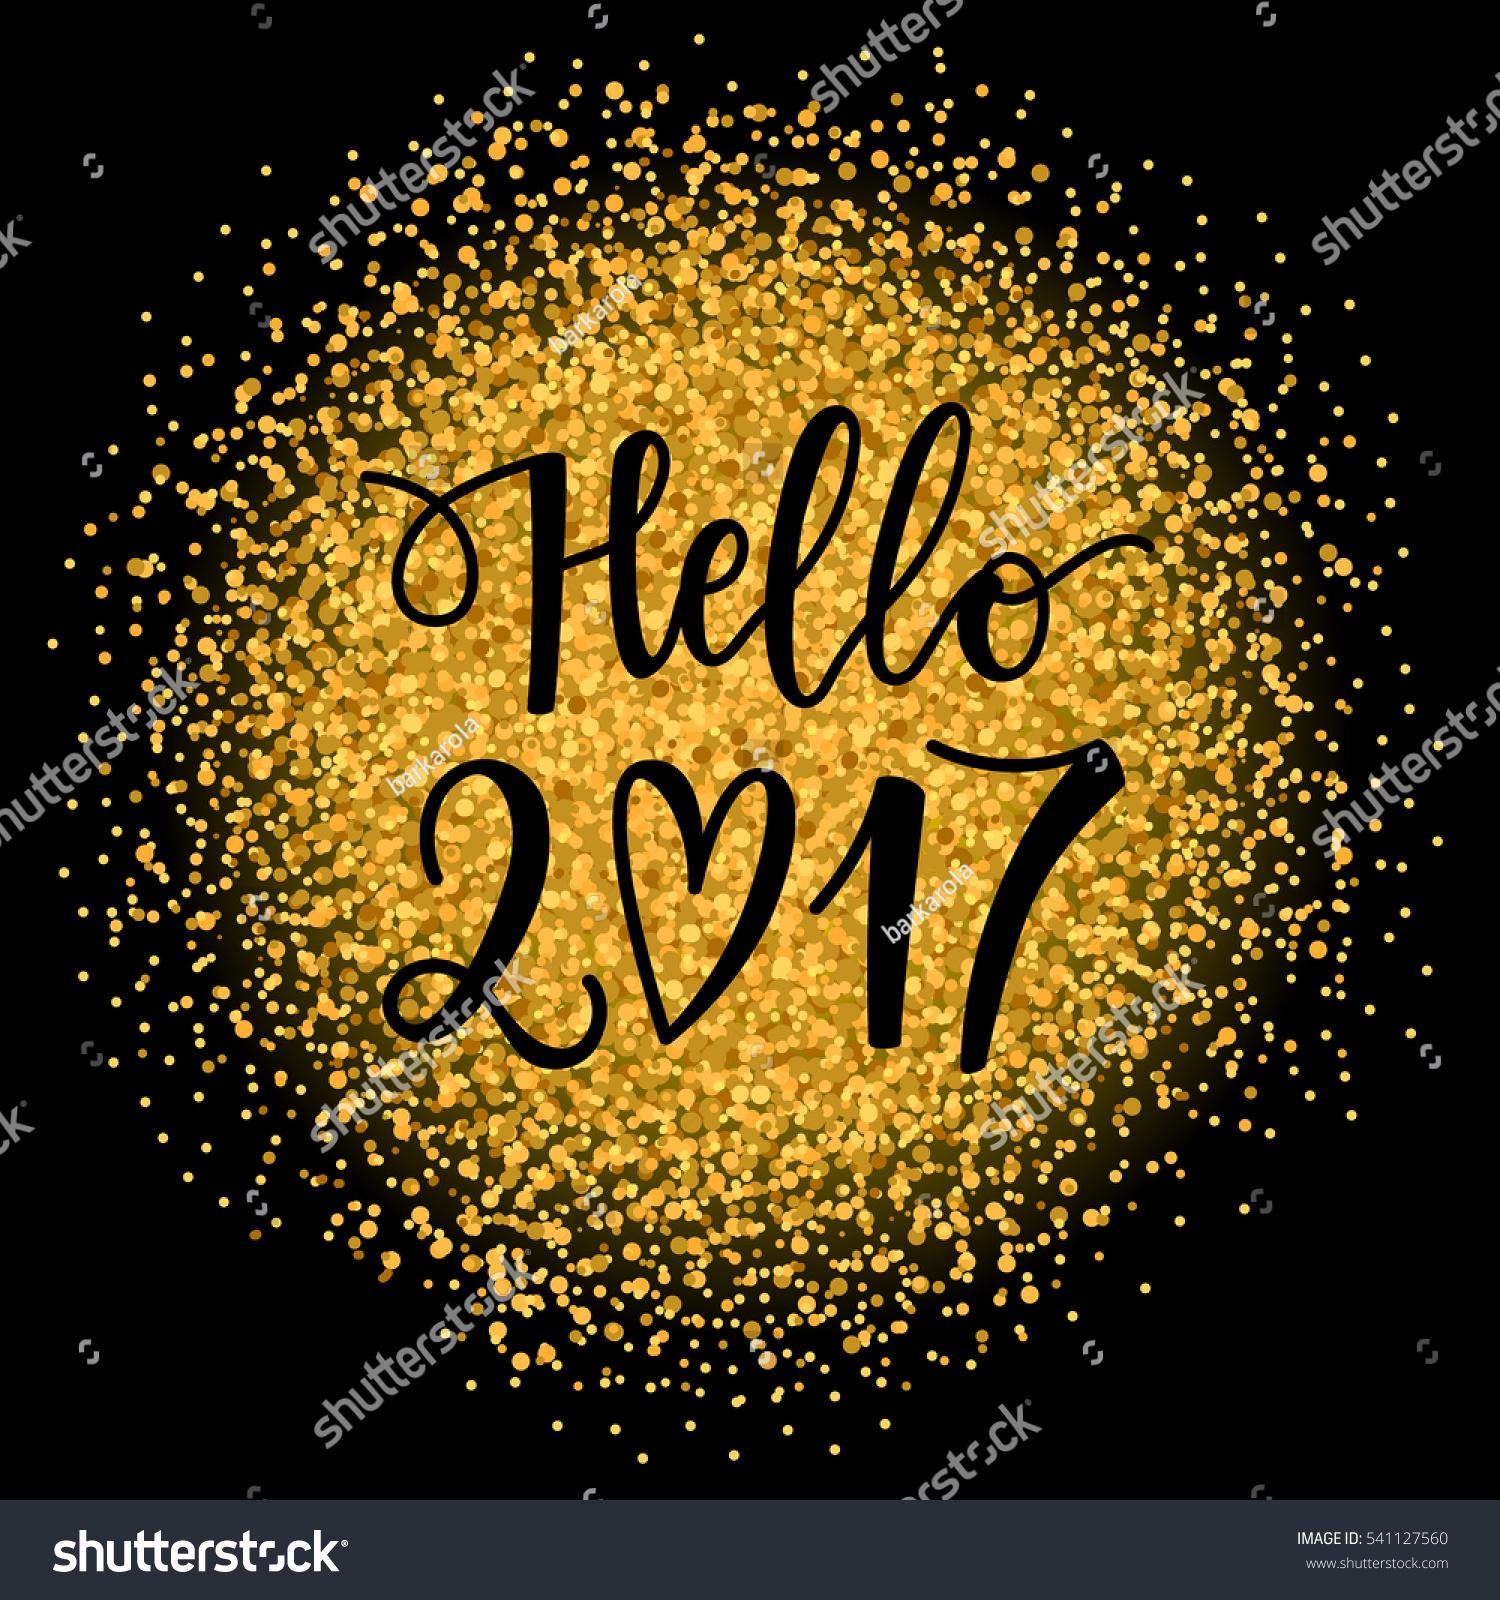 vector hand drawn hello phrase stock vector  vector hand drawn hello 2017 phrase on a glitter background new year card holiday